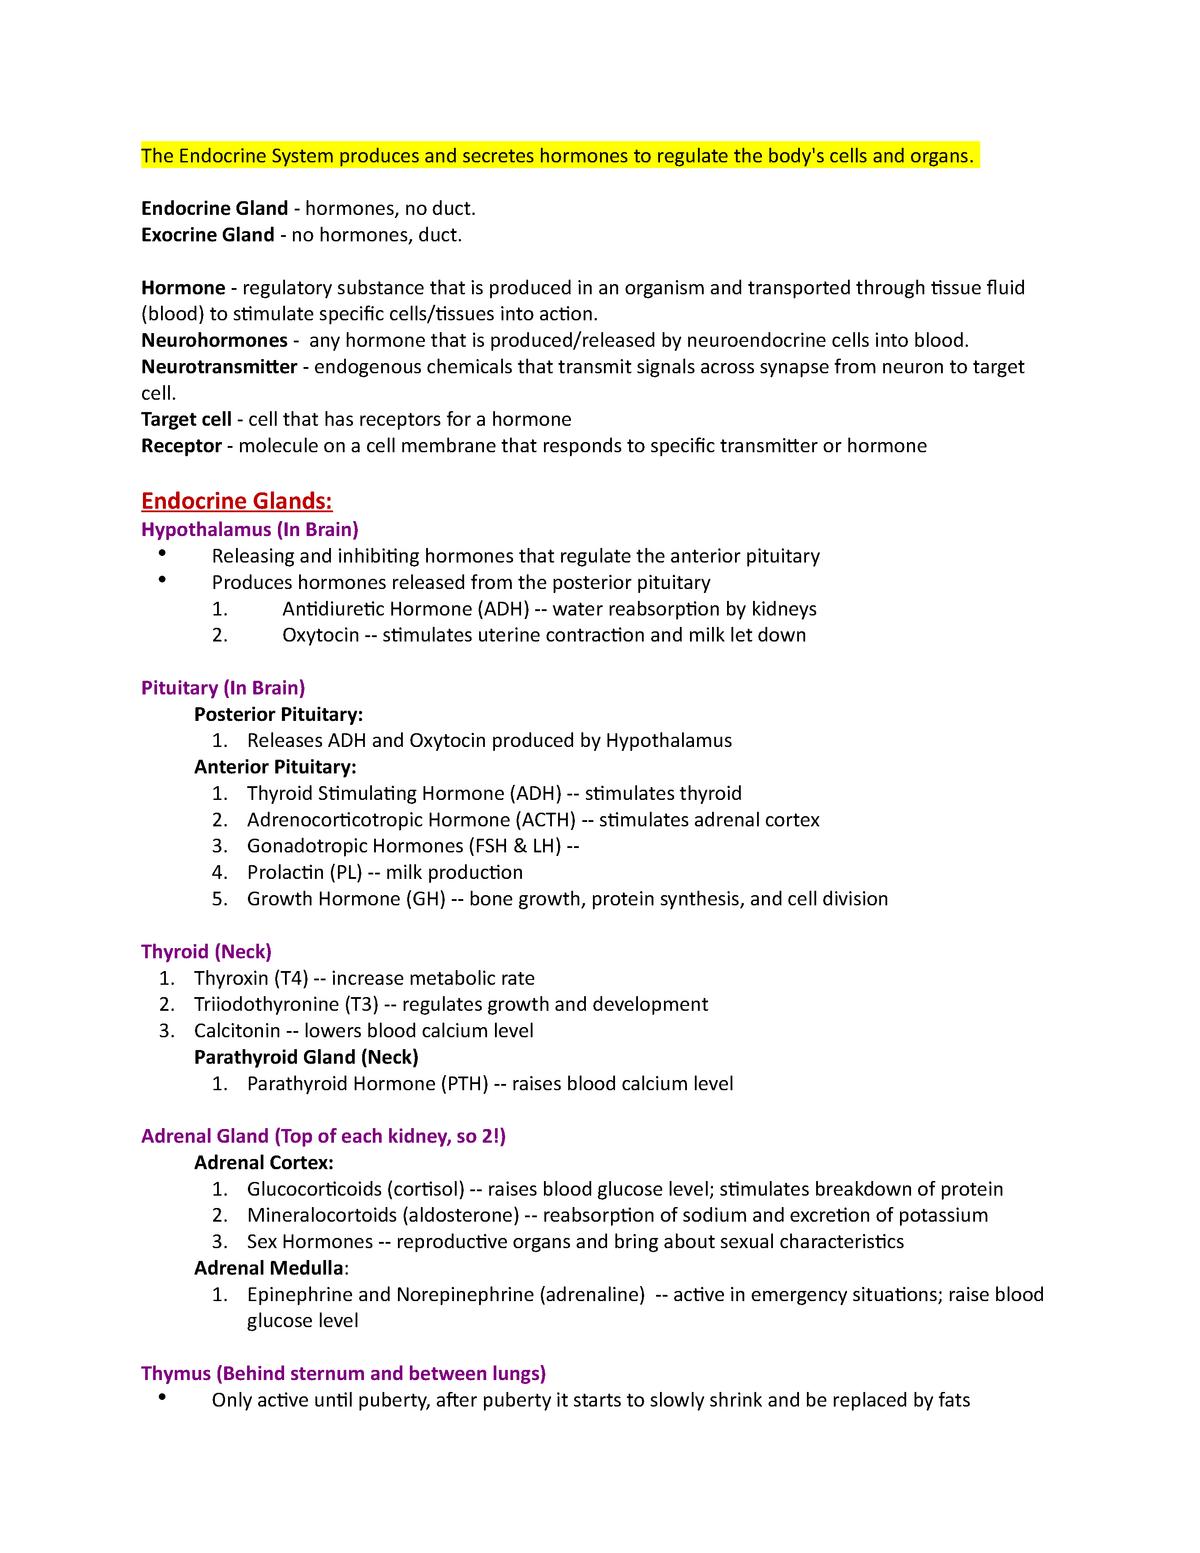 Endocrine System Phsl P 130 Human Biology Studocu